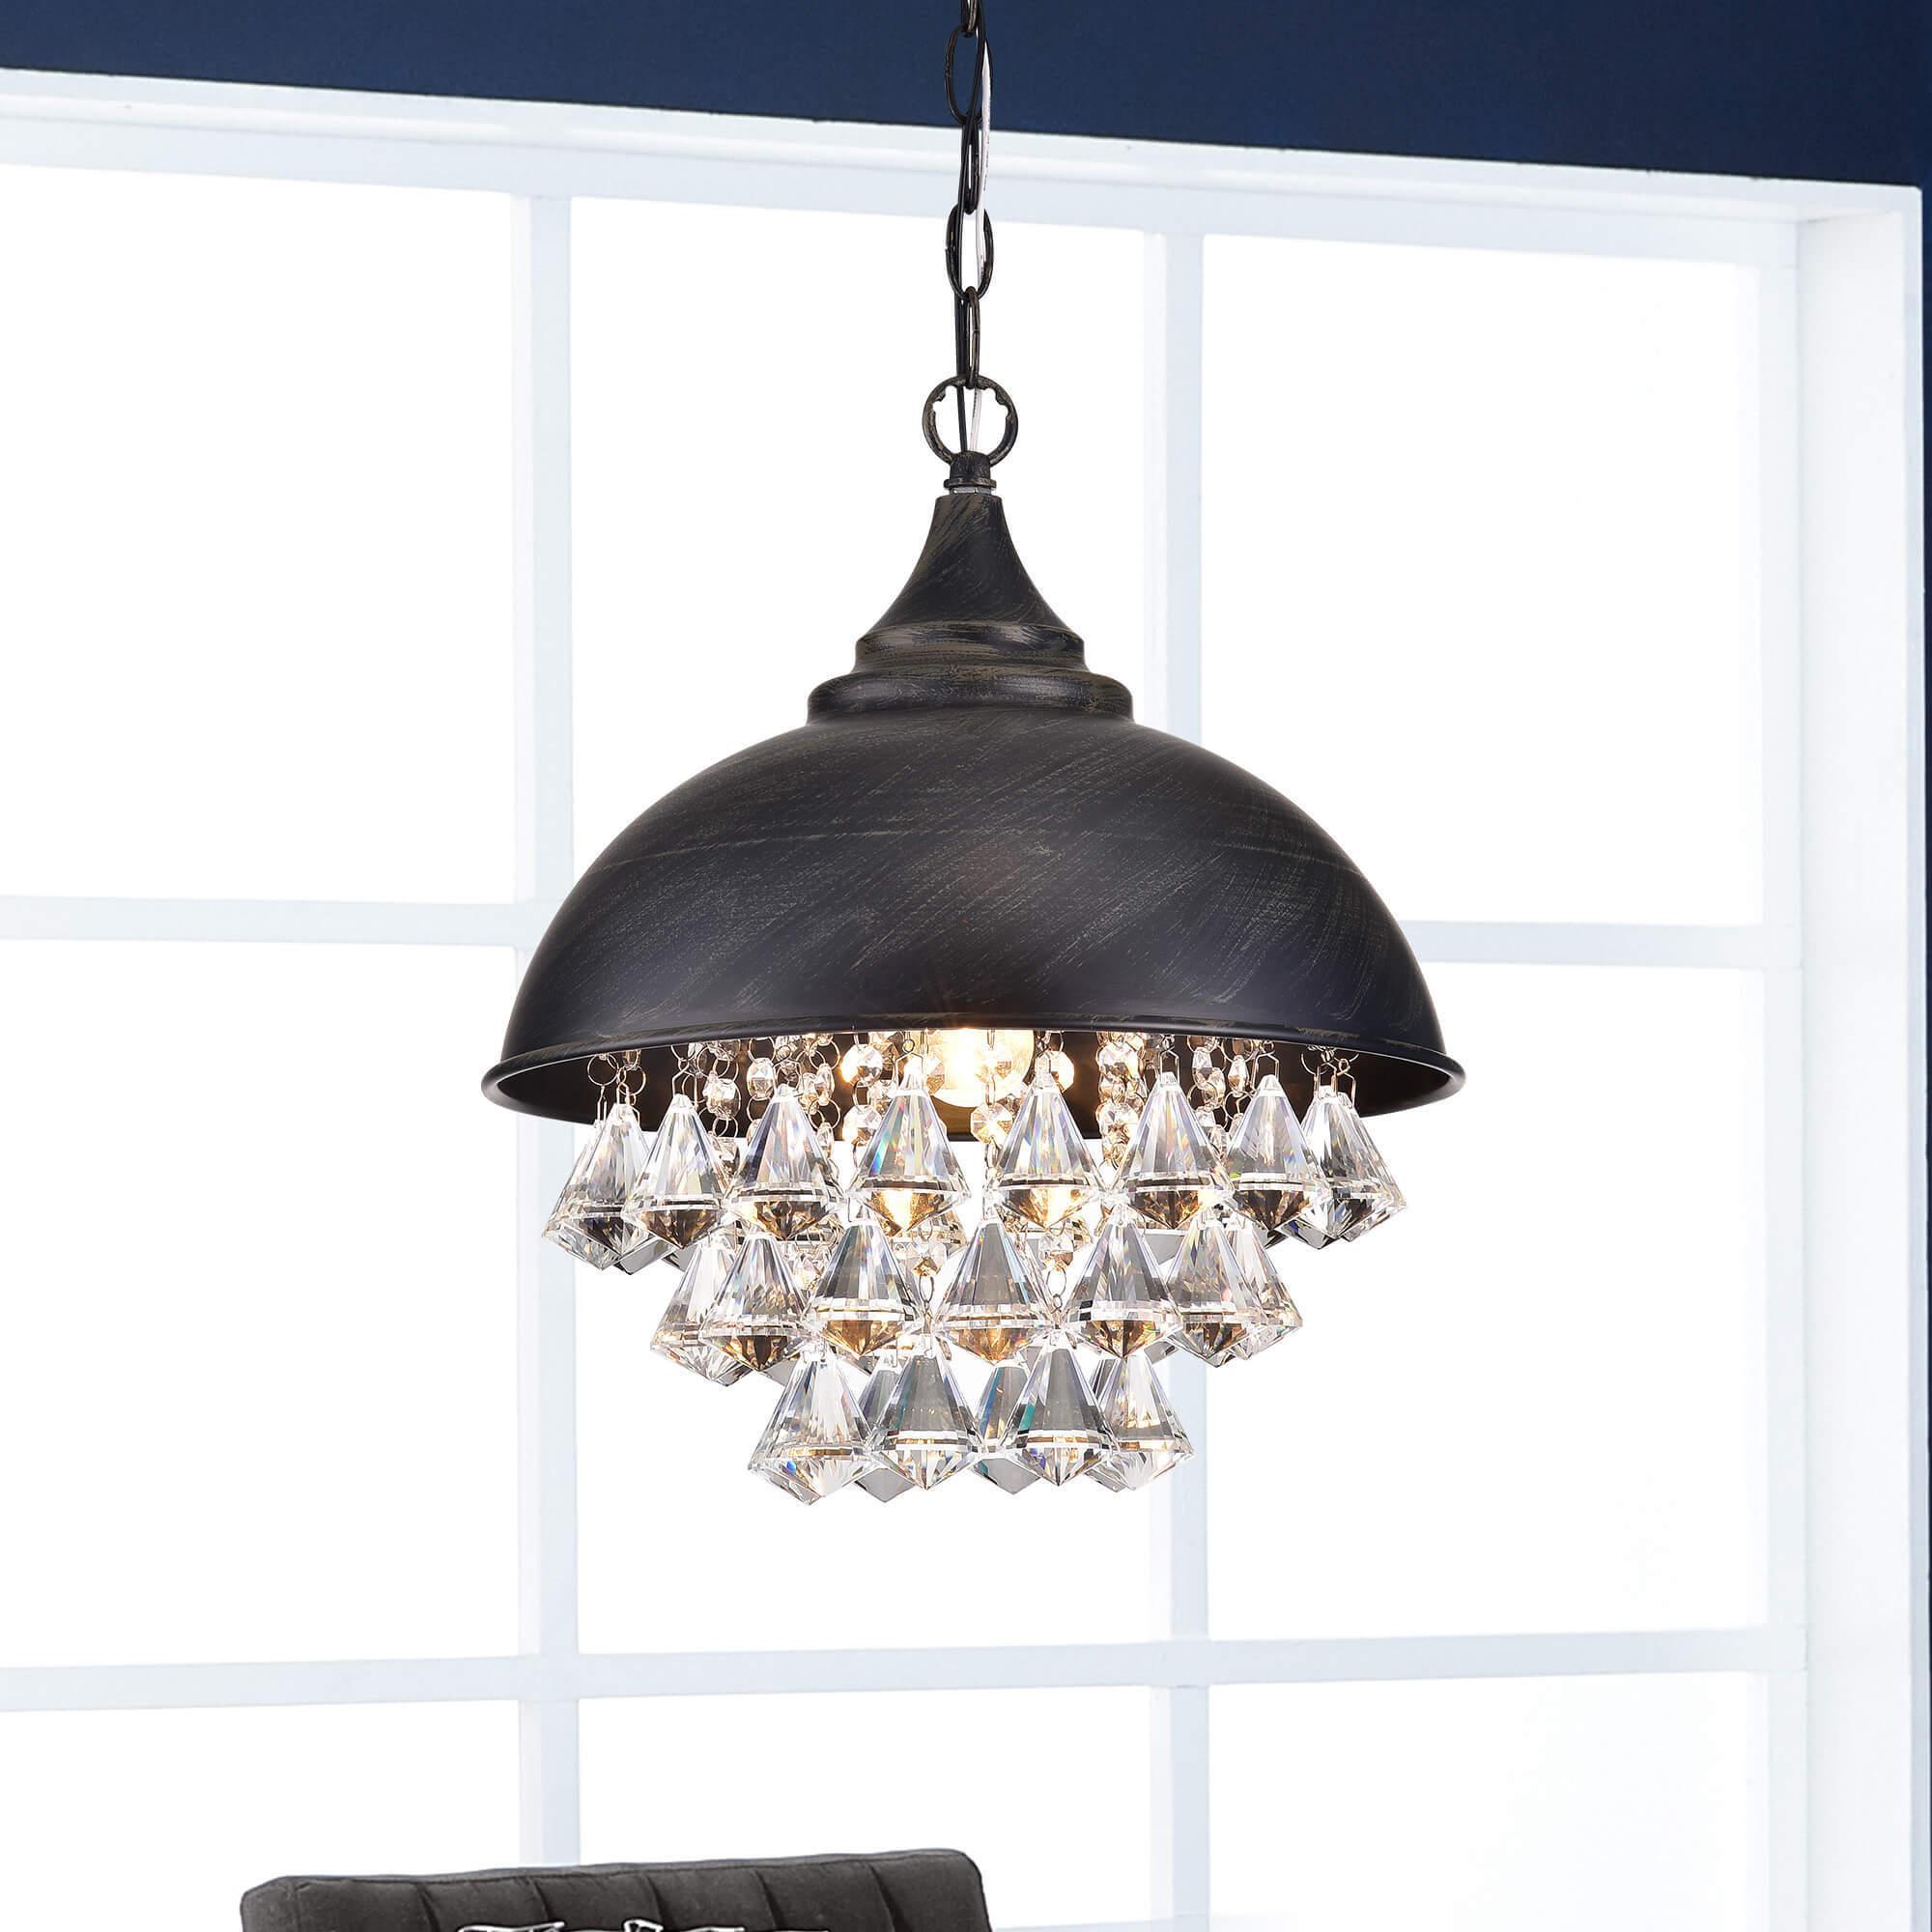 Shop visalia antique black single light crystal chandelier ships to canada overstock 18087296